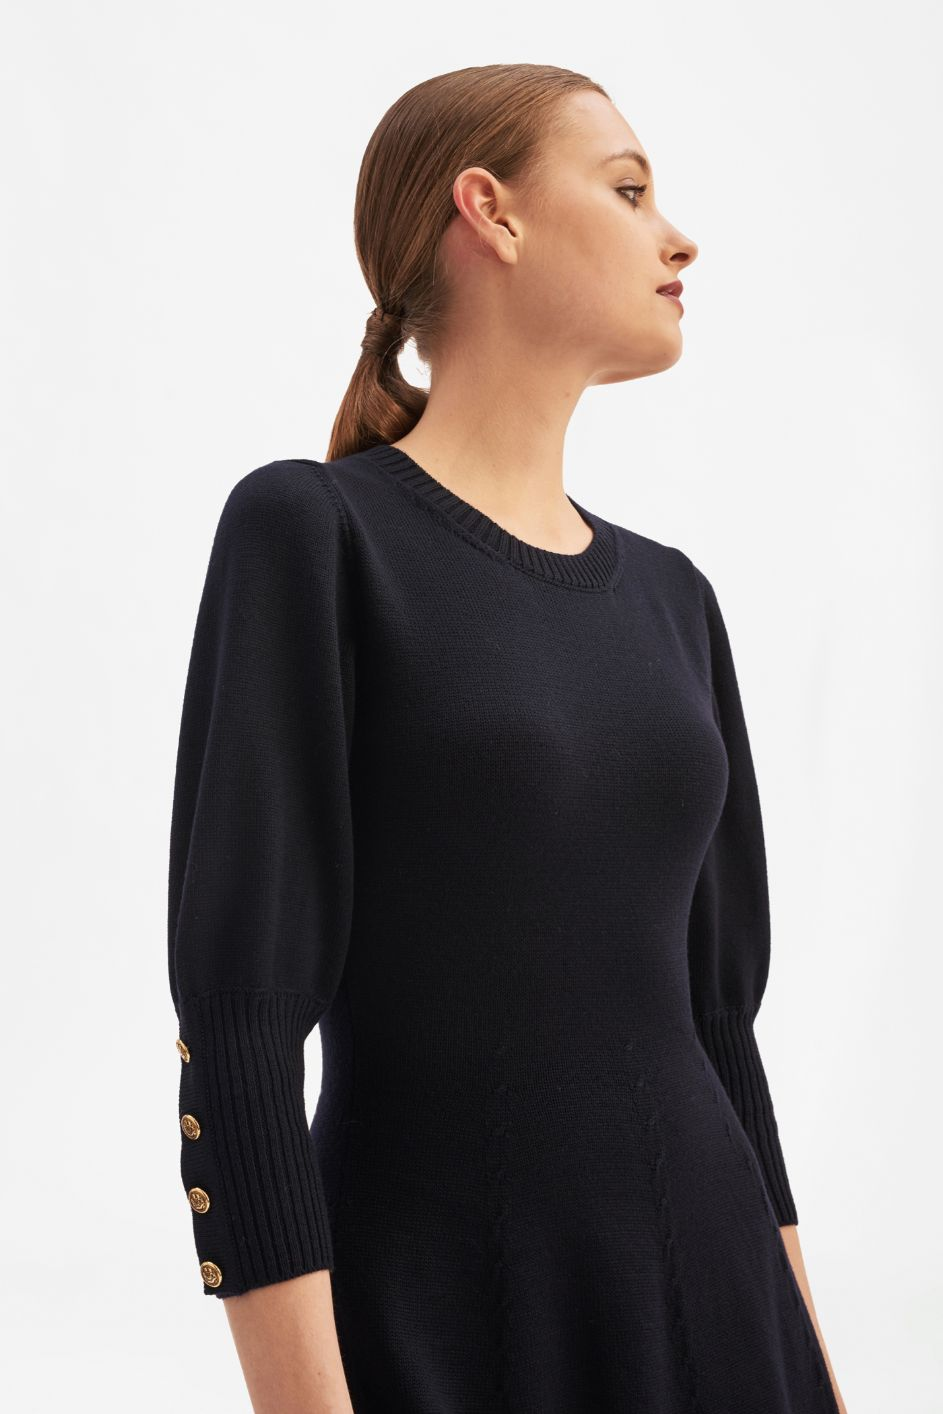 METEORE DRESS 1270 3